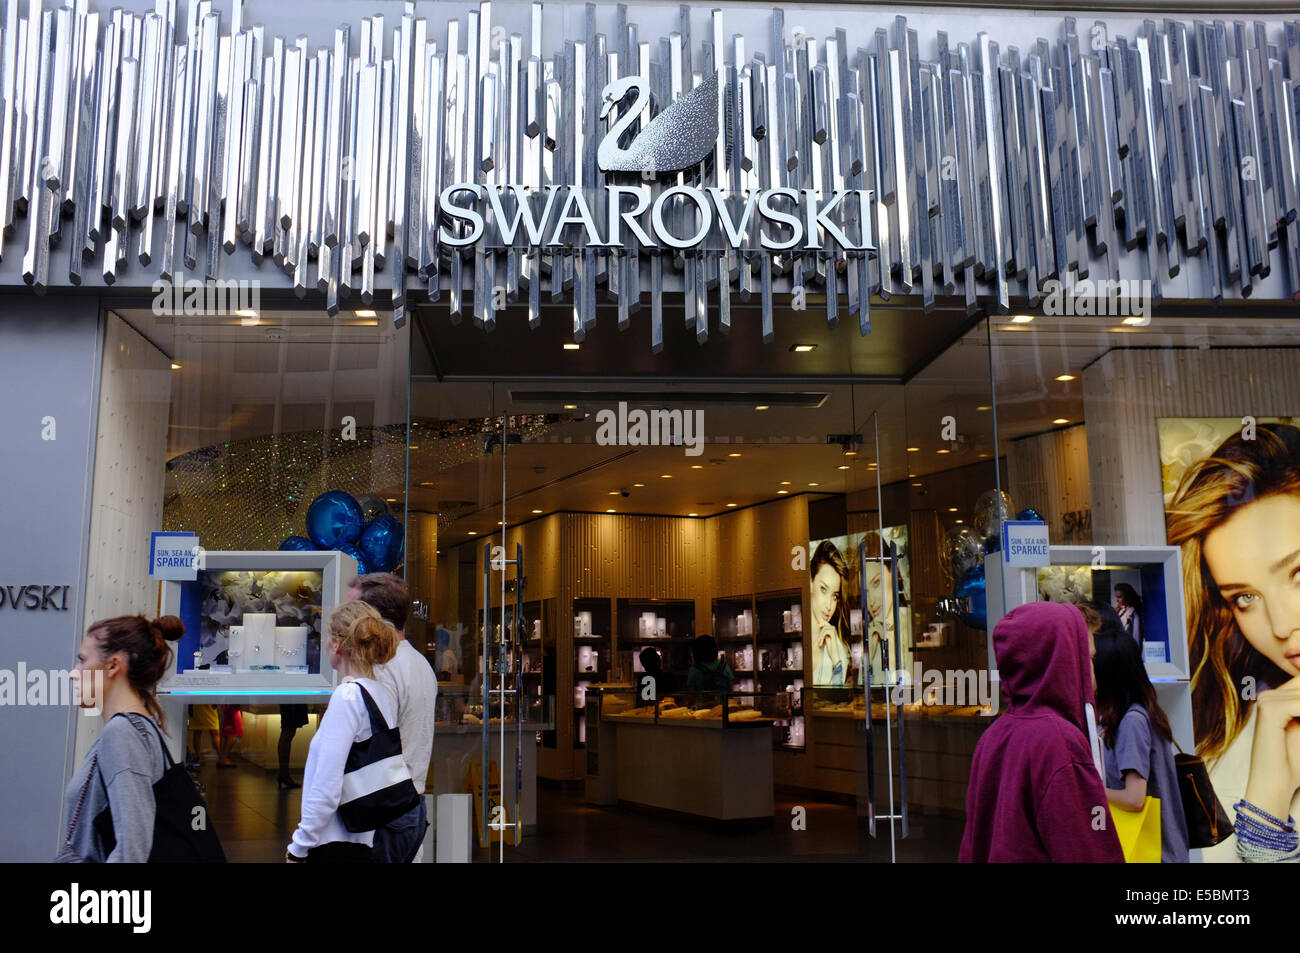 SWAROVSKI shop on Oxford Street eb1c1b56e3